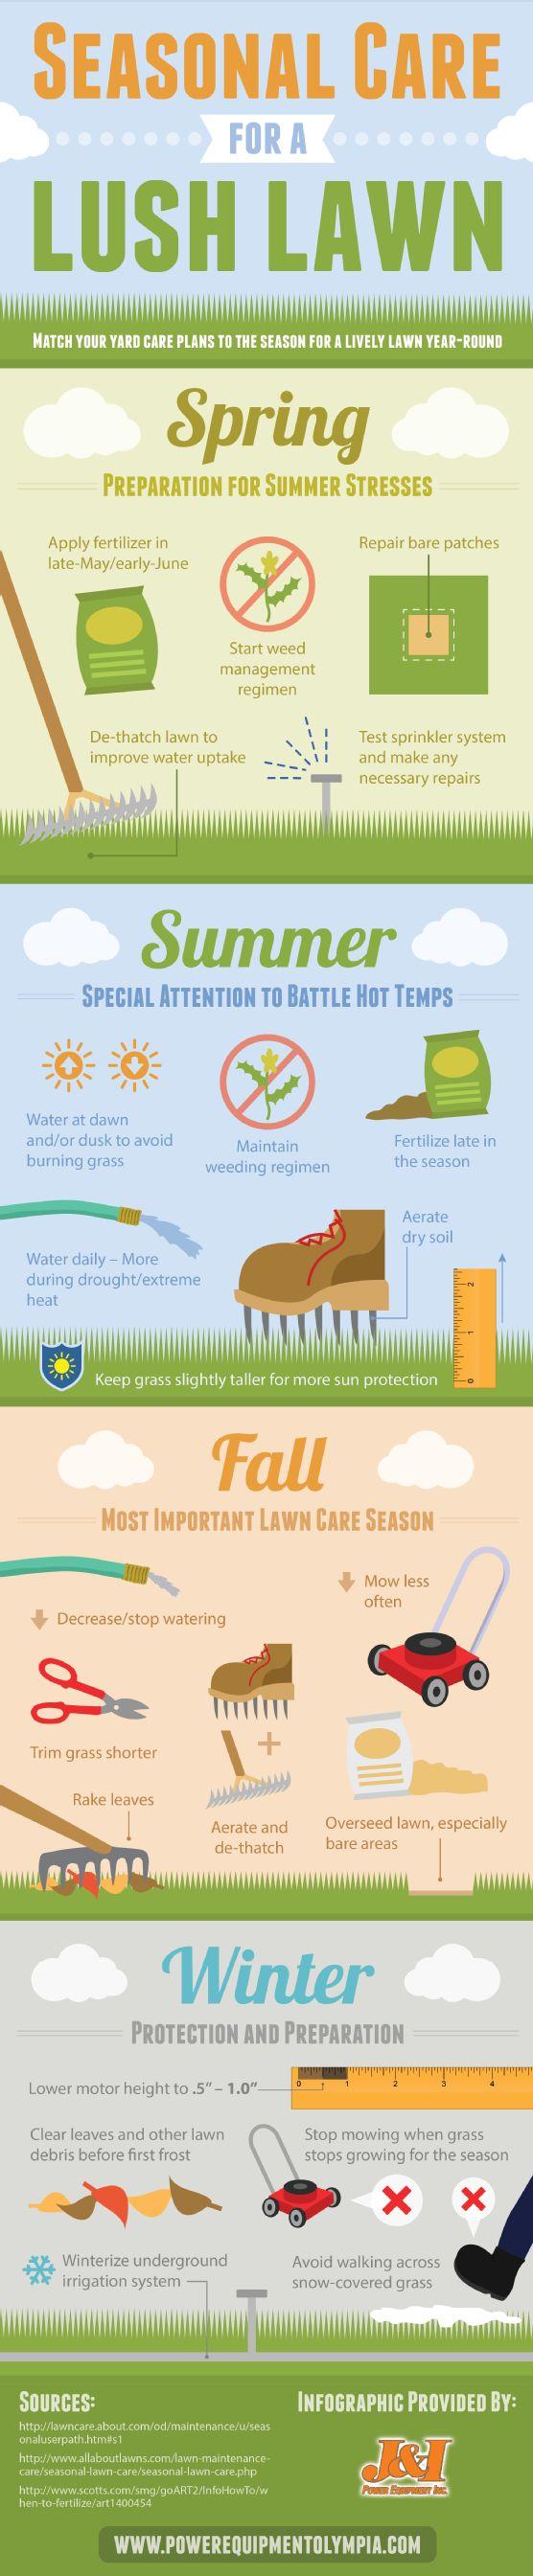 Seasonal Care for a Lush Lawn